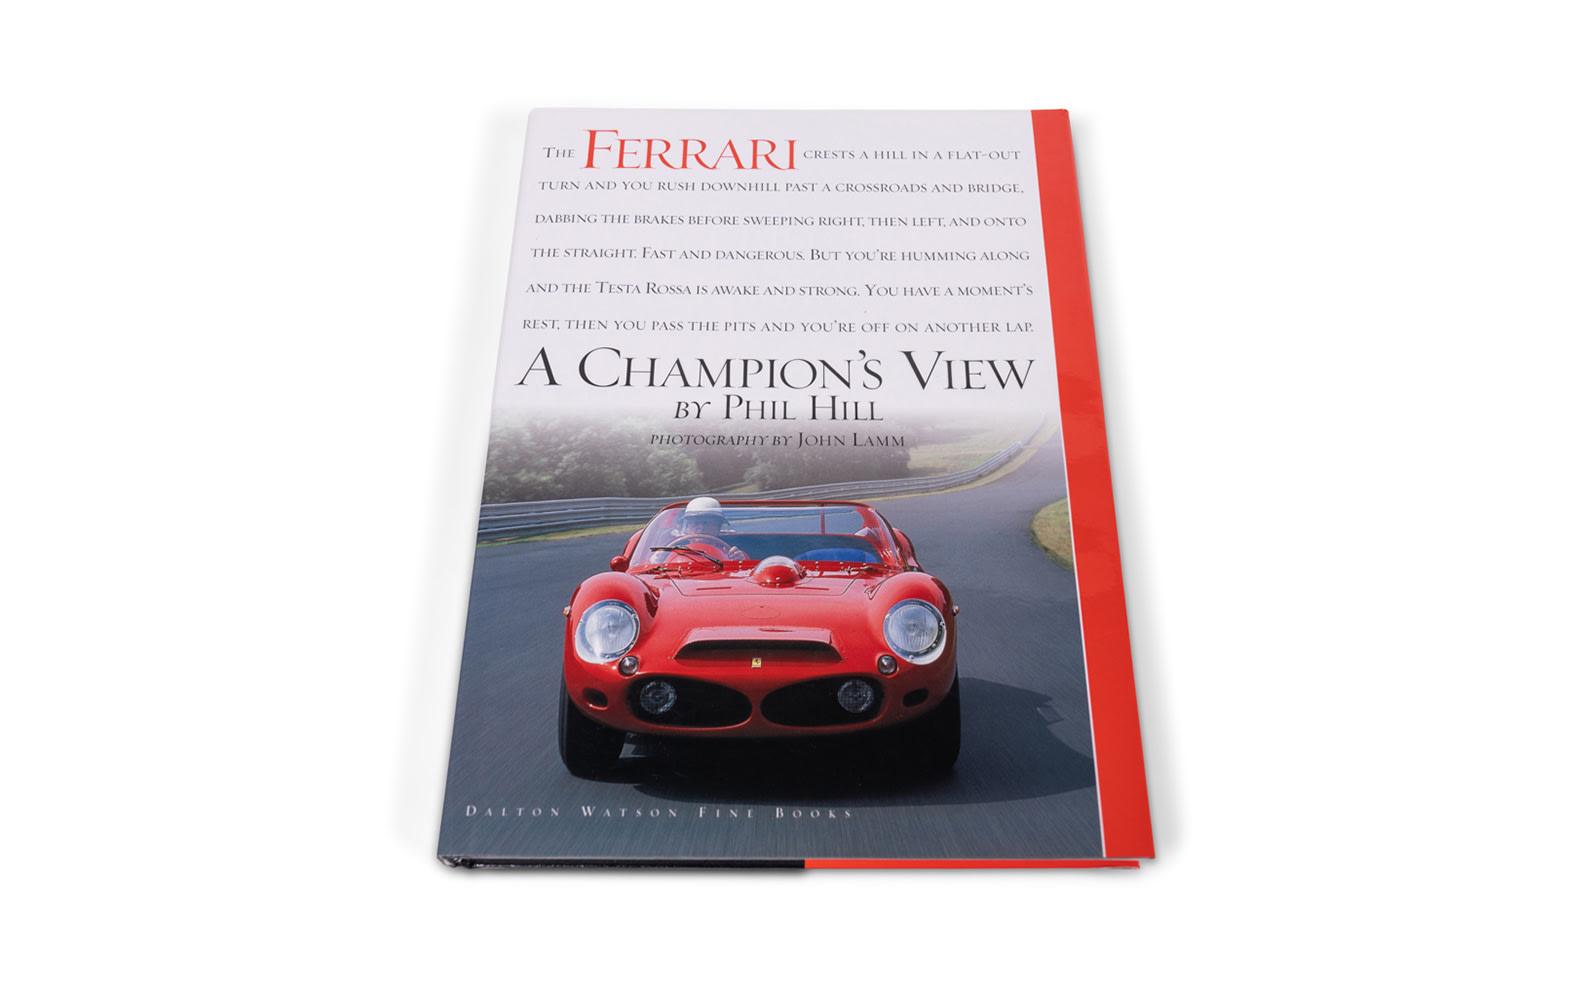 Ferrari - A Champion's View Book by Phil Hill